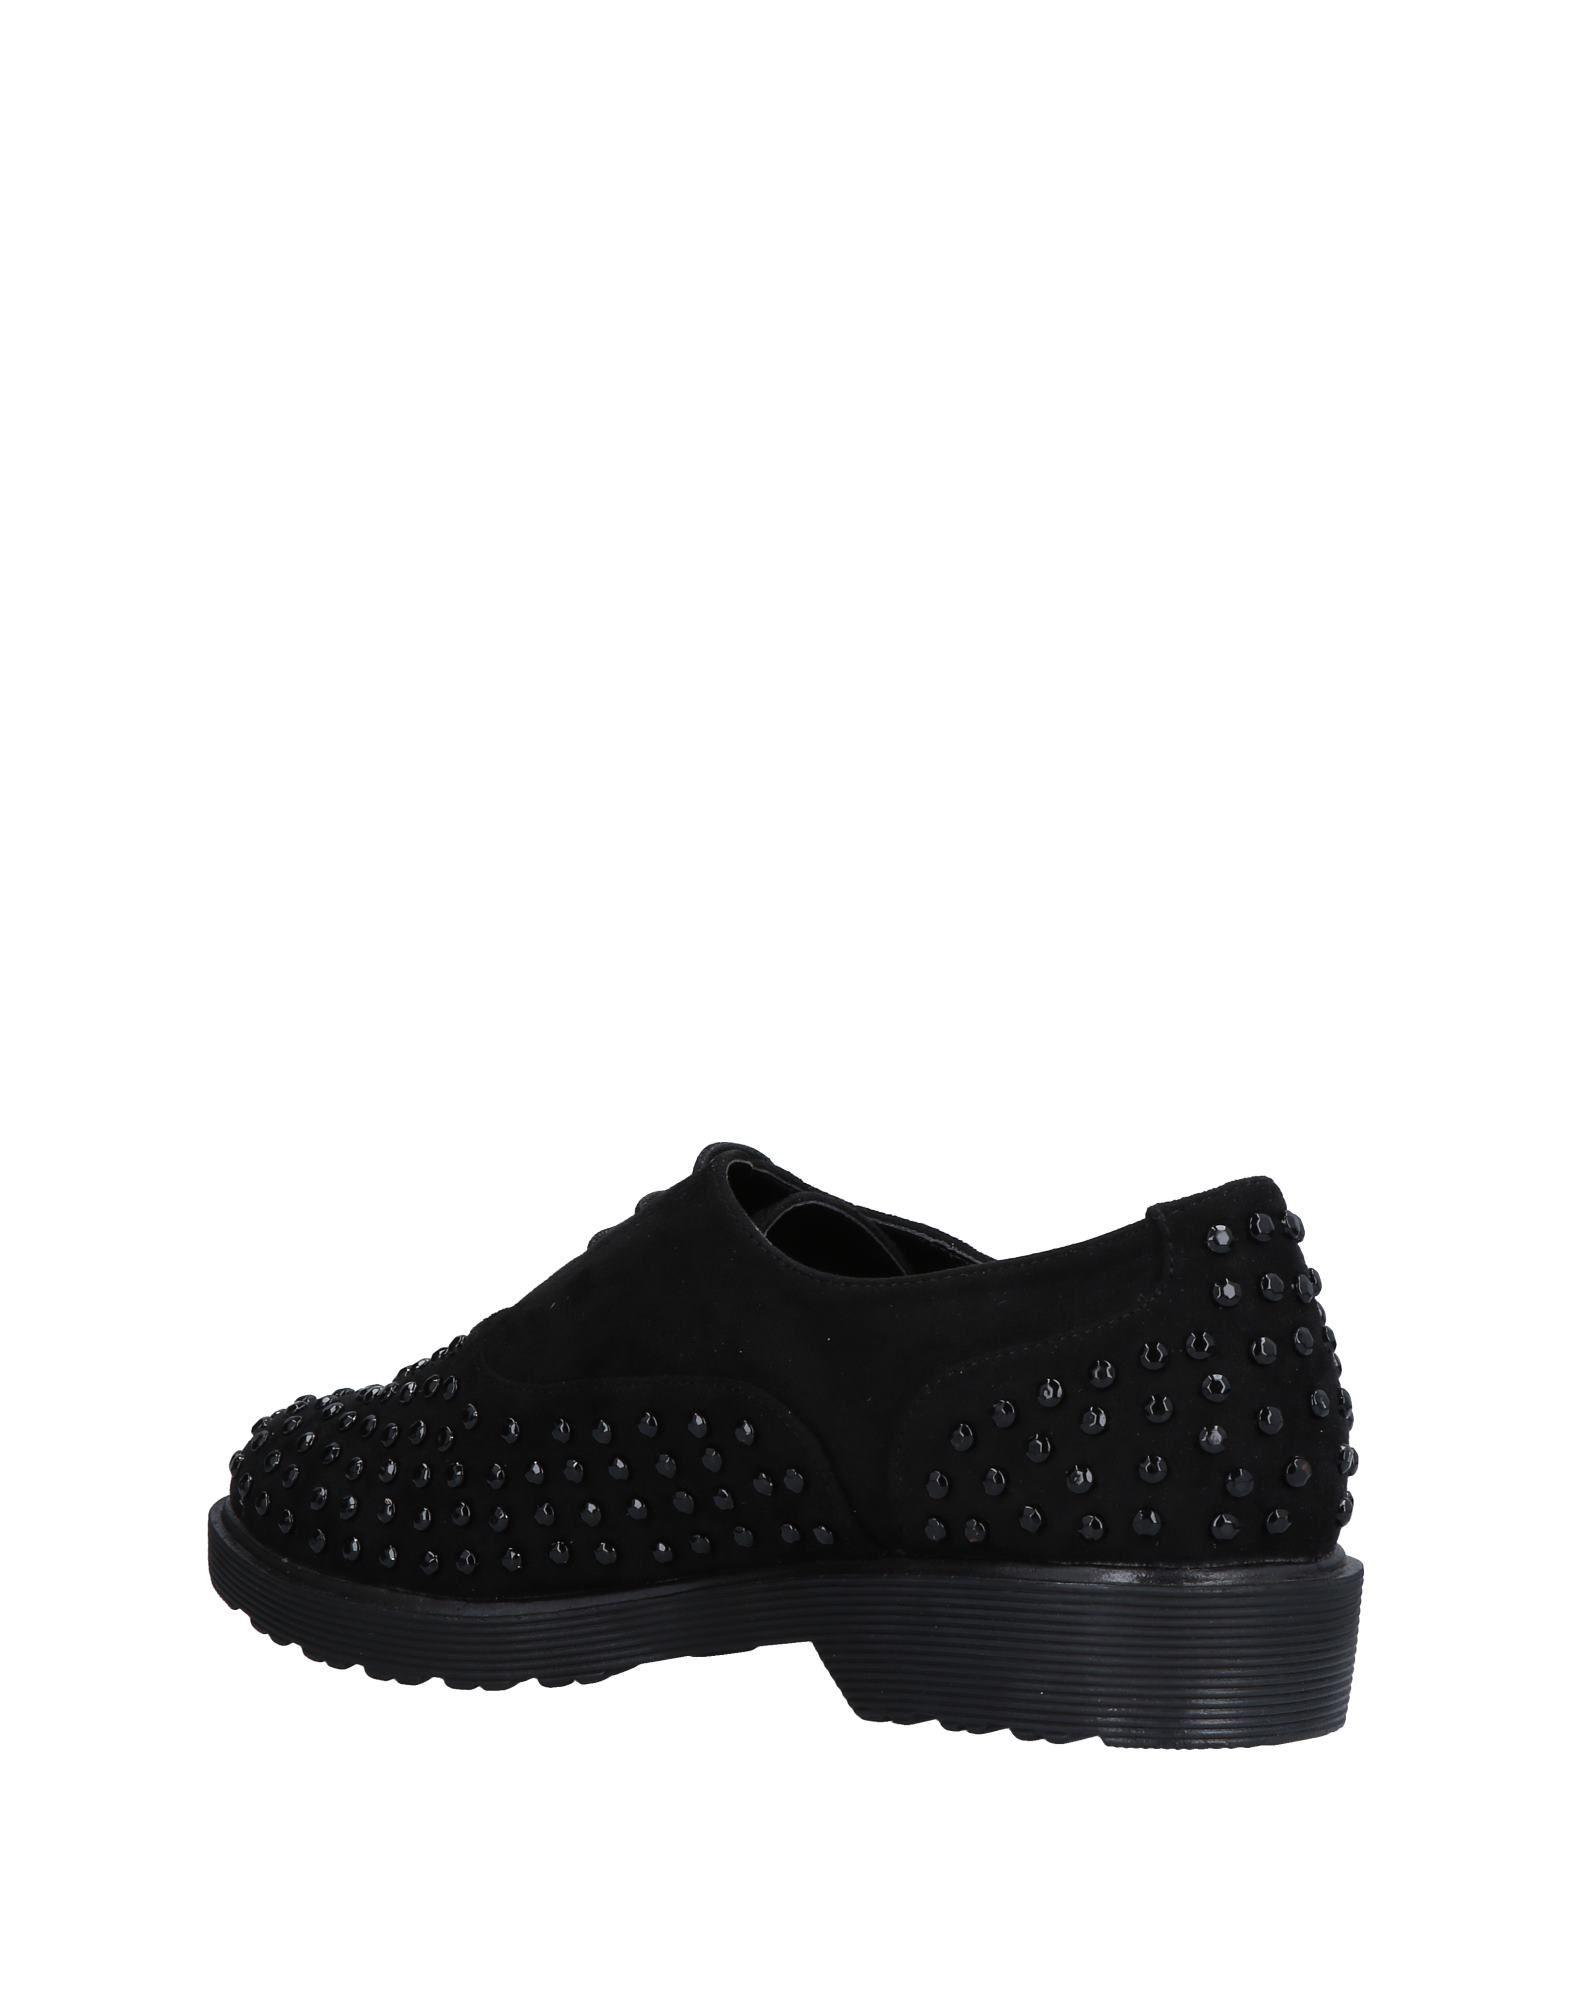 Laura Biagiotti Schnürschuhe Damen  Schuhe 11504413HK Gute Qualität beliebte Schuhe  c3b1e2